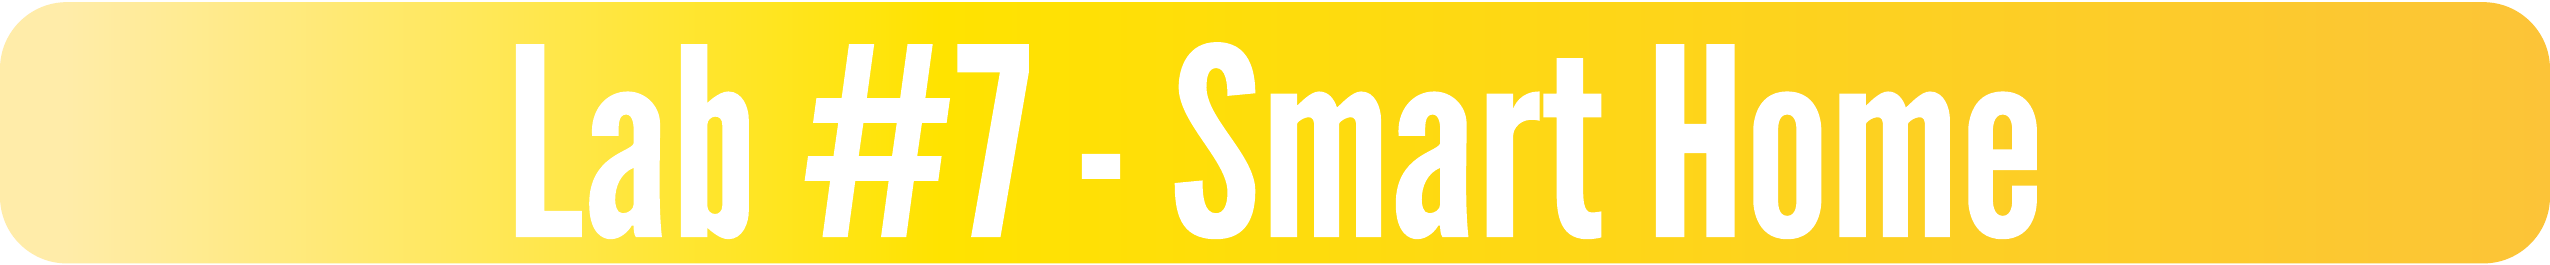 Lab #7 - Smart Home